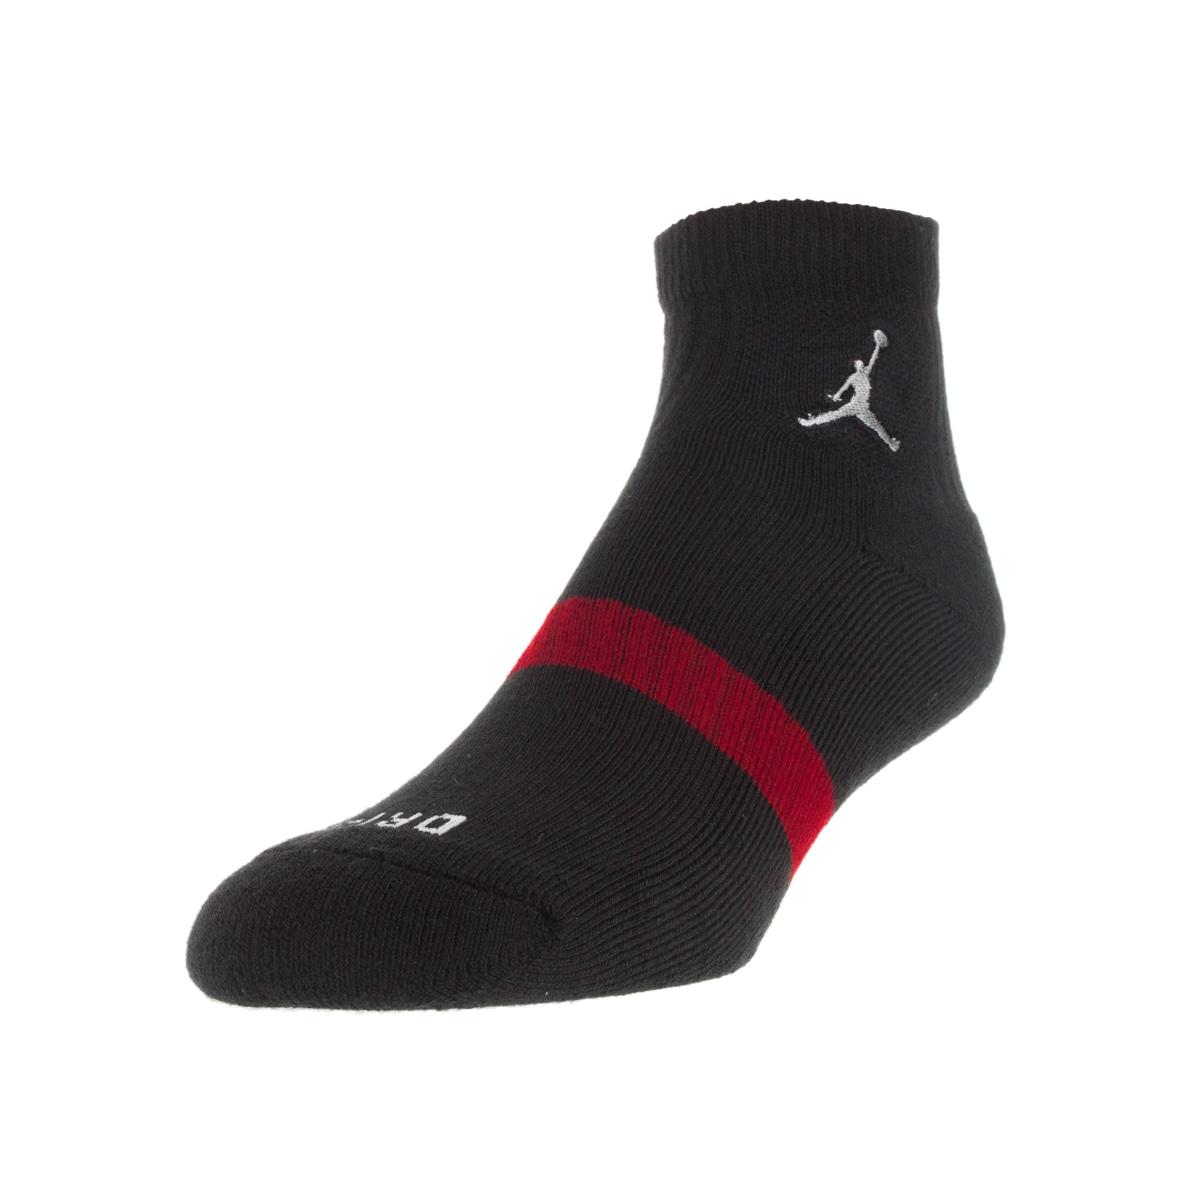 Nike Jordan Men's Low Quarter Dri-Fit Small Socks (S), Bl...